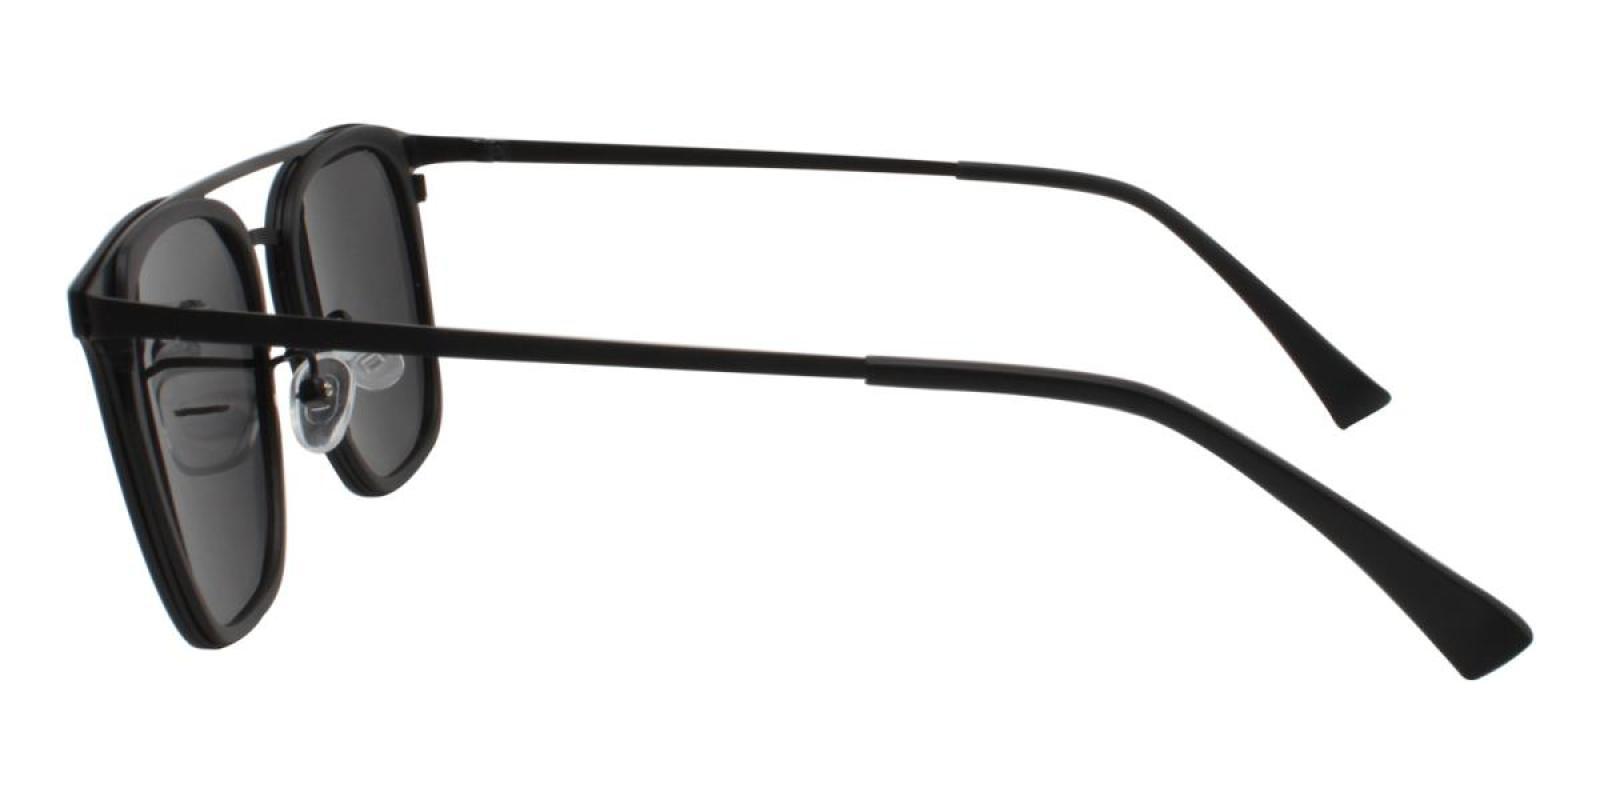 Seagual-Black-Aviator-Combination / Metal / TR-Sunglasses-additional3